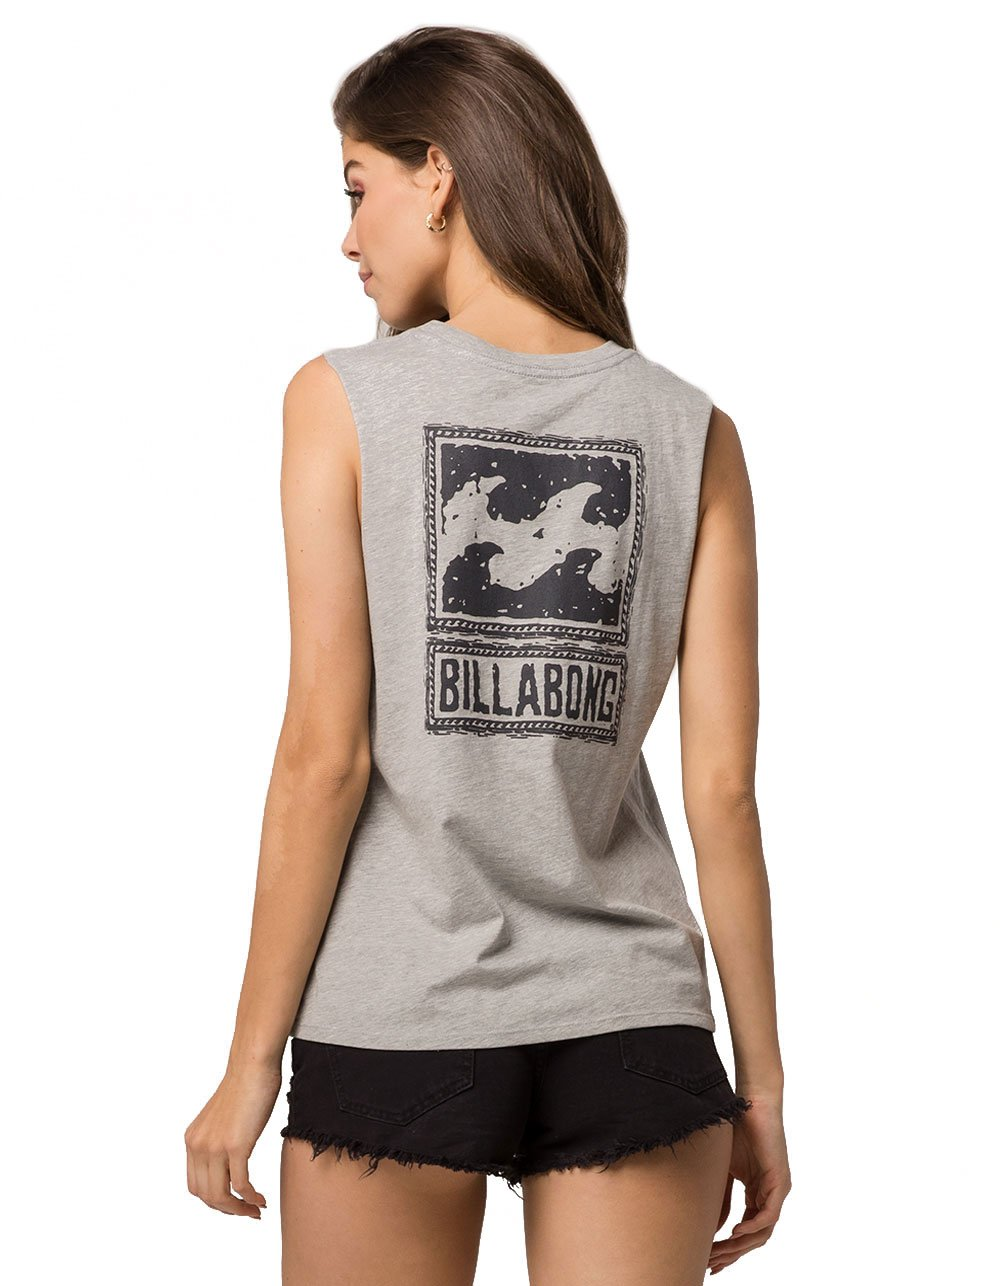 Billabong Same Love Muscle Tank, Grey, Small